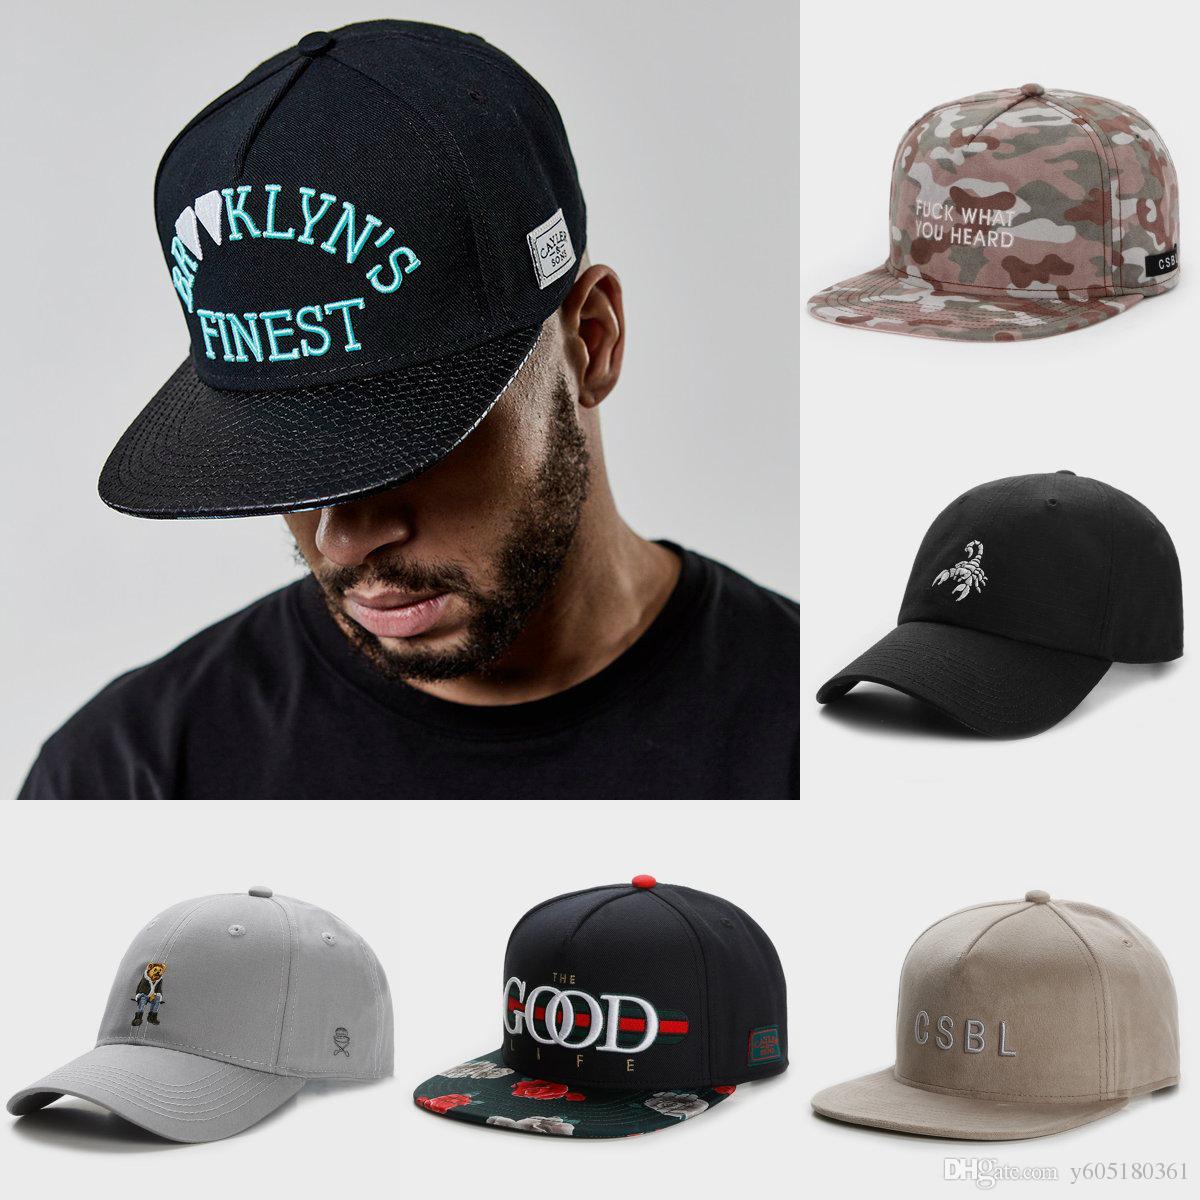 39b35343d High Quality Men Women Snapback Caps Hip-hop Hat Youth Cap Basketball Snapbacks  Hats Cayler And Sons Corner Gray Casual Baseball Cap 6 Style Mens Hats ...